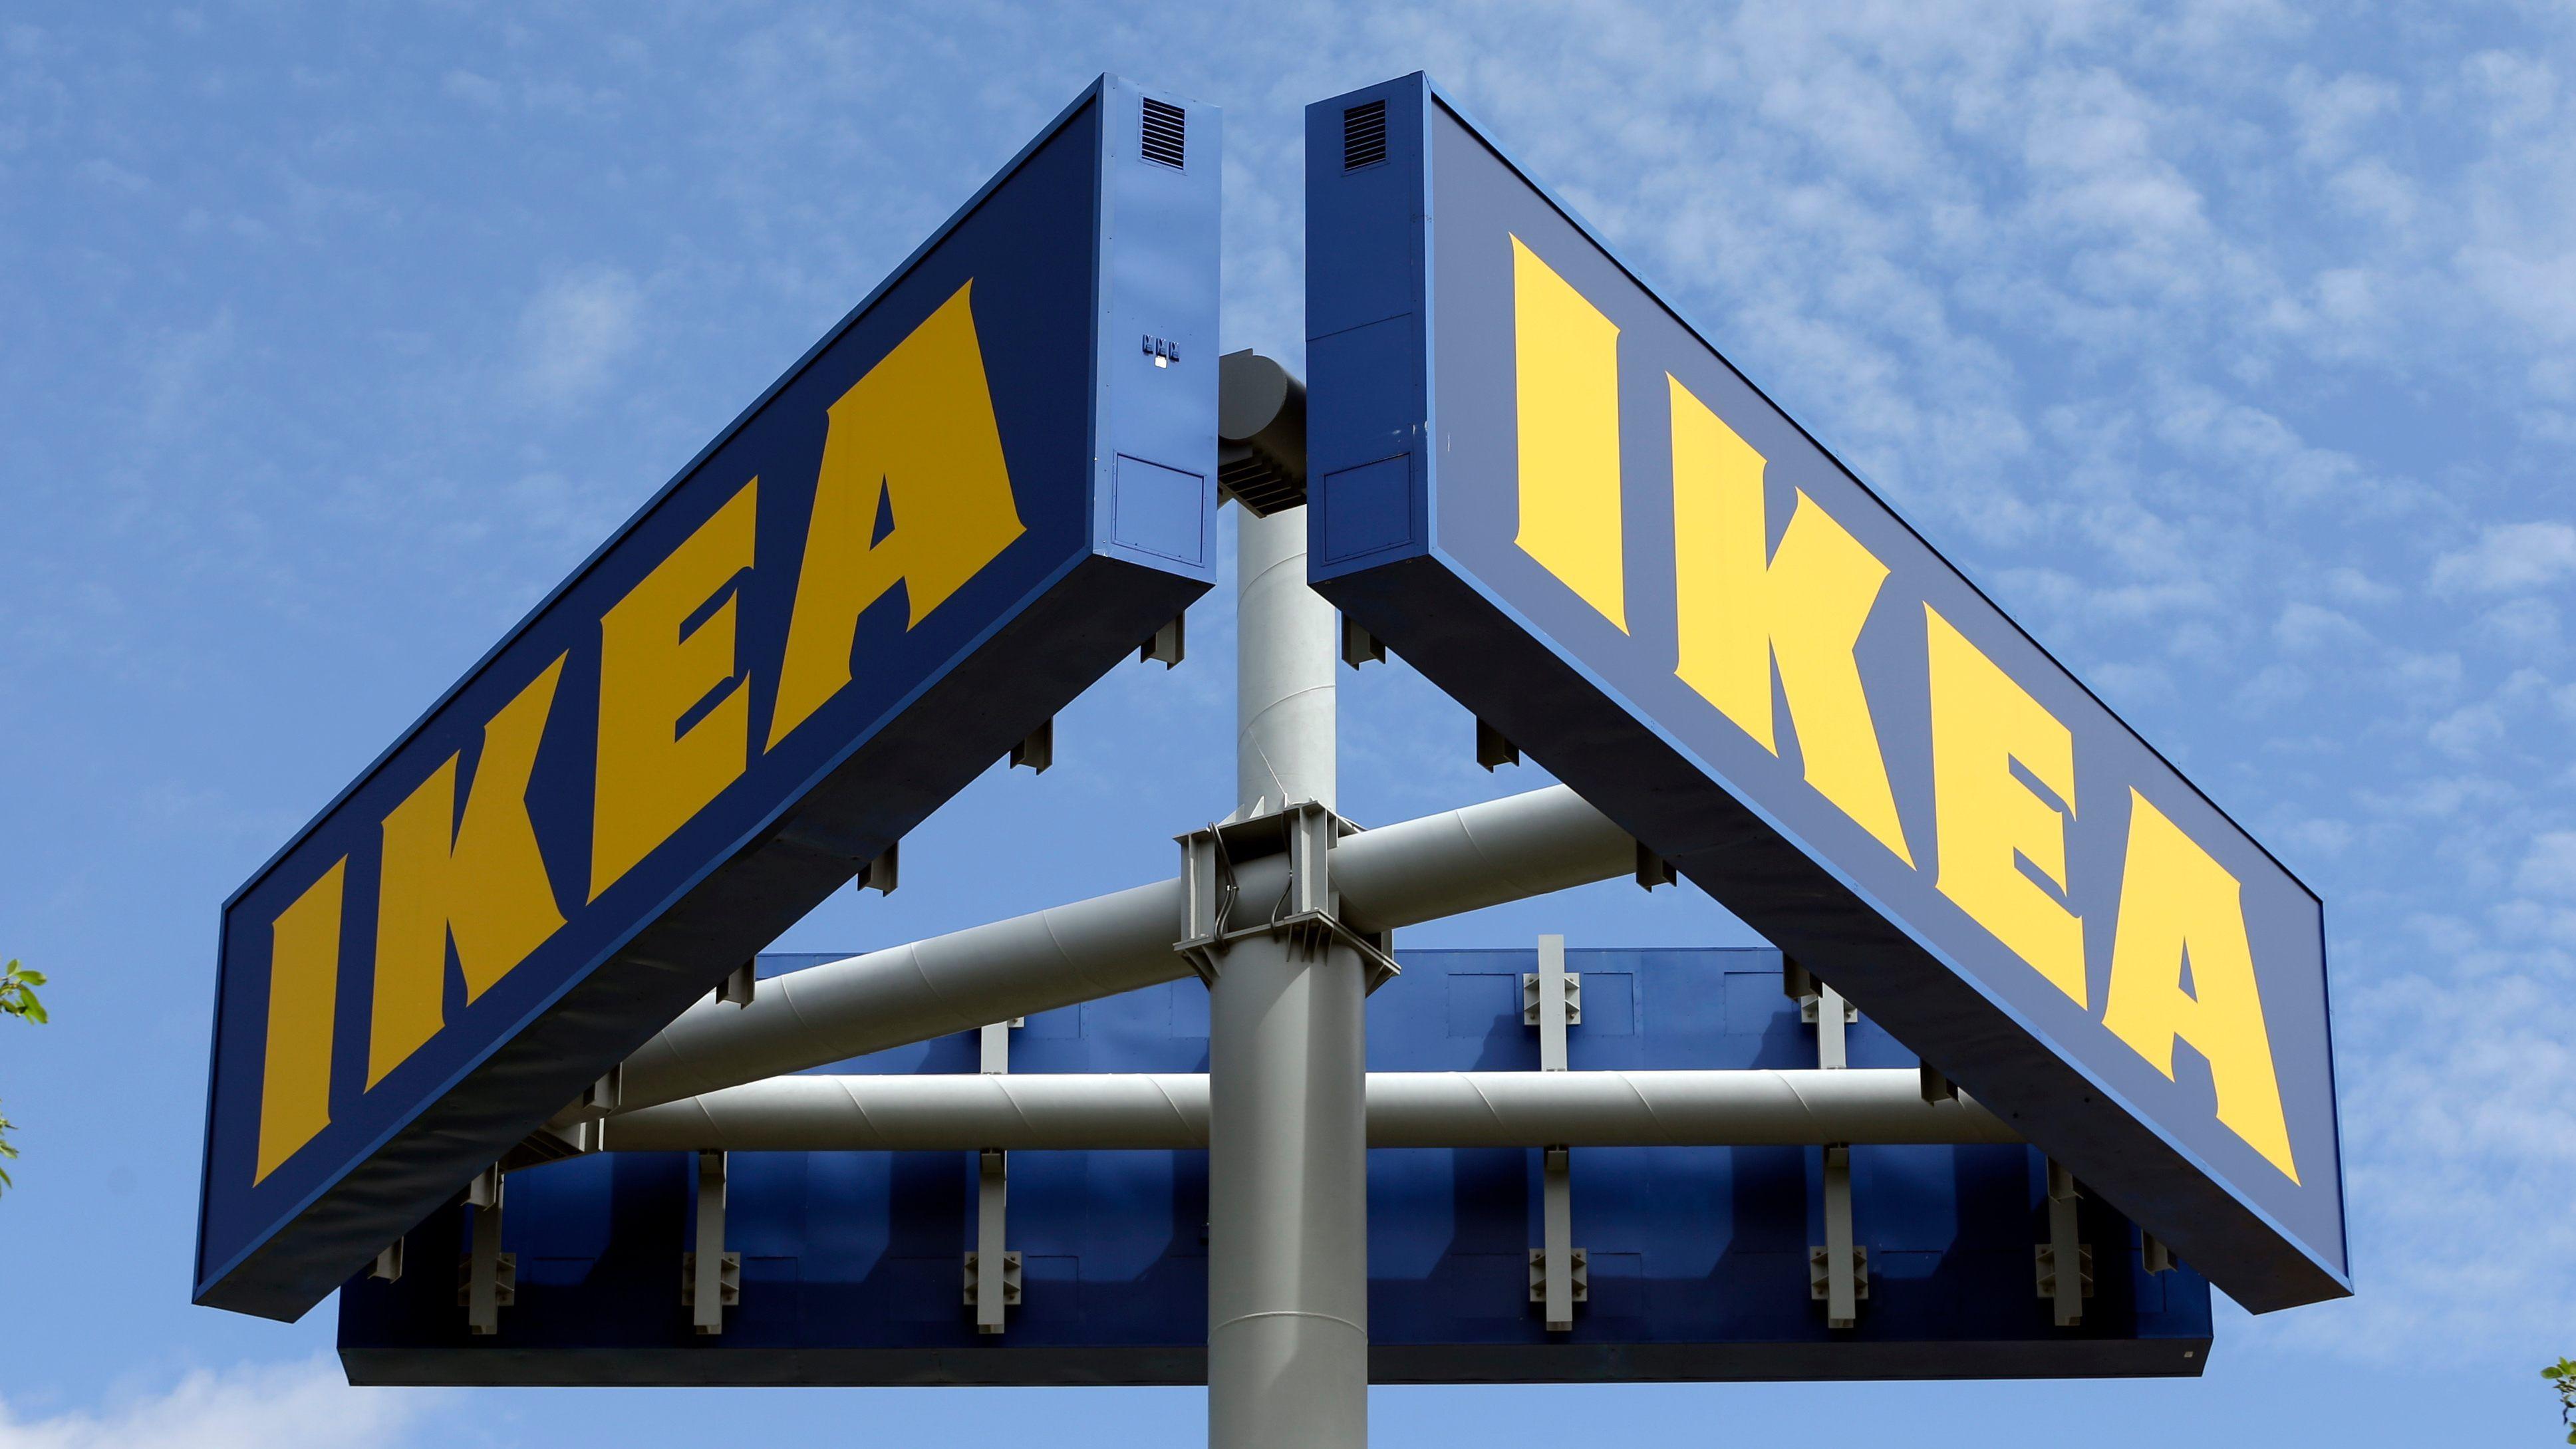 Ikea nimmt gebrauchte m bel zur ck so funktioniert s Ikea security jobs